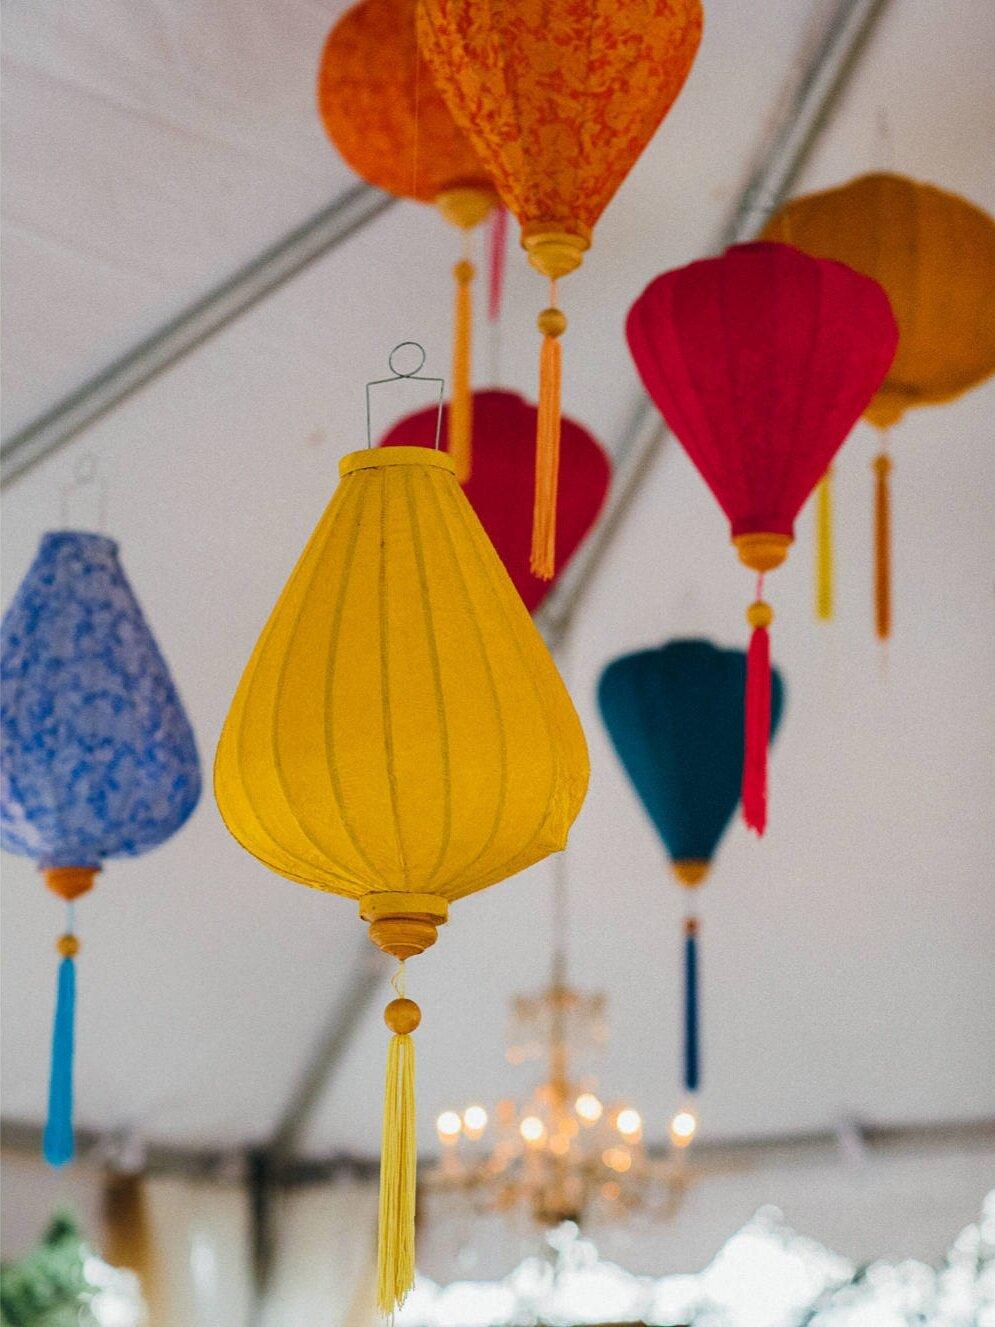 Hanging Yellow Lantern from Vintage Ambiance , image by Jenn Tai Photo Artistry